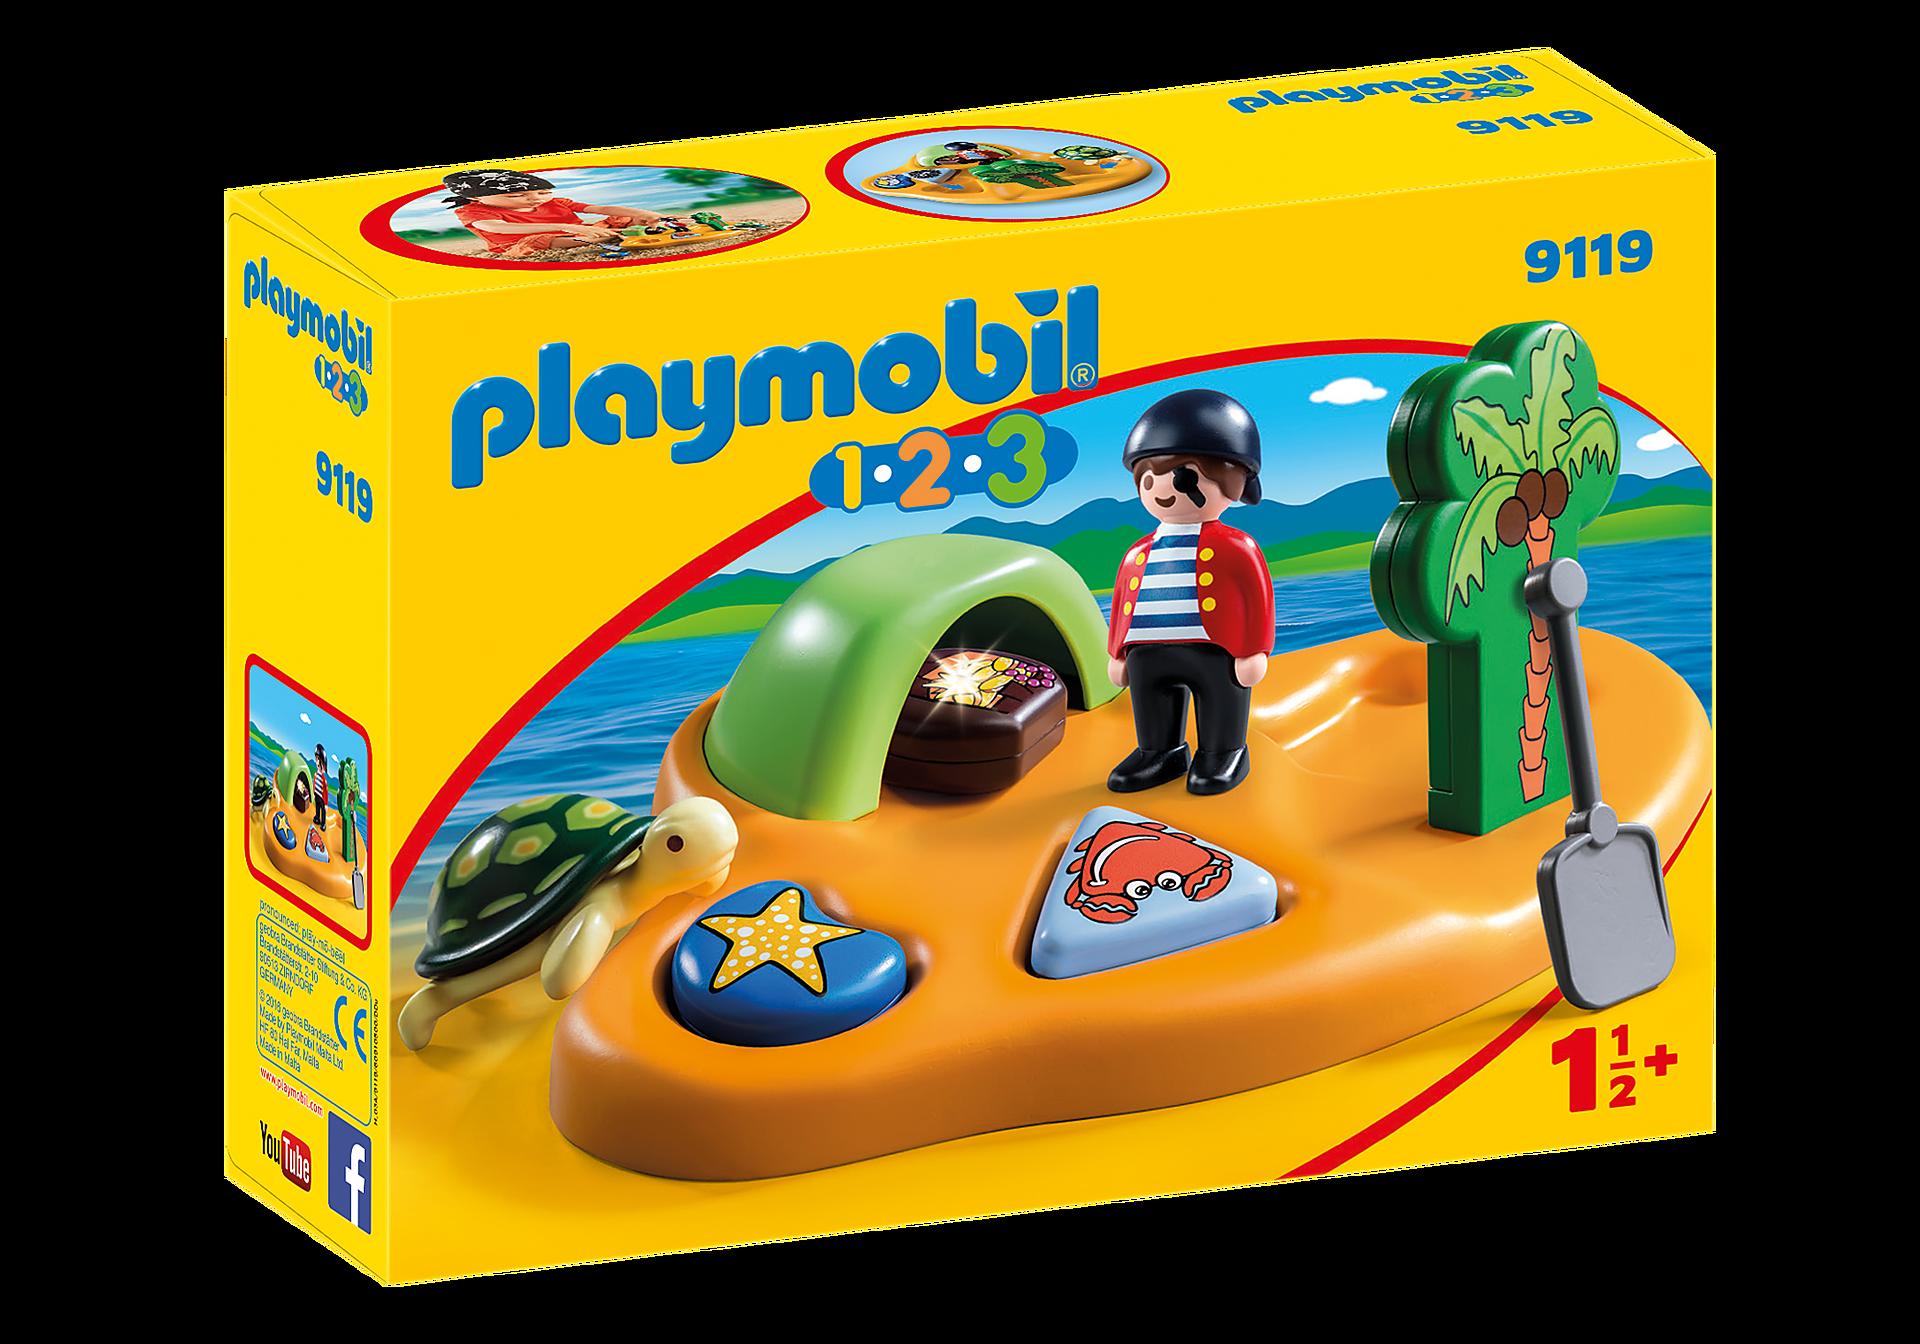 http://media.playmobil.com/i/playmobil/9119_product_box_front/1.2.3 Isla Pirata